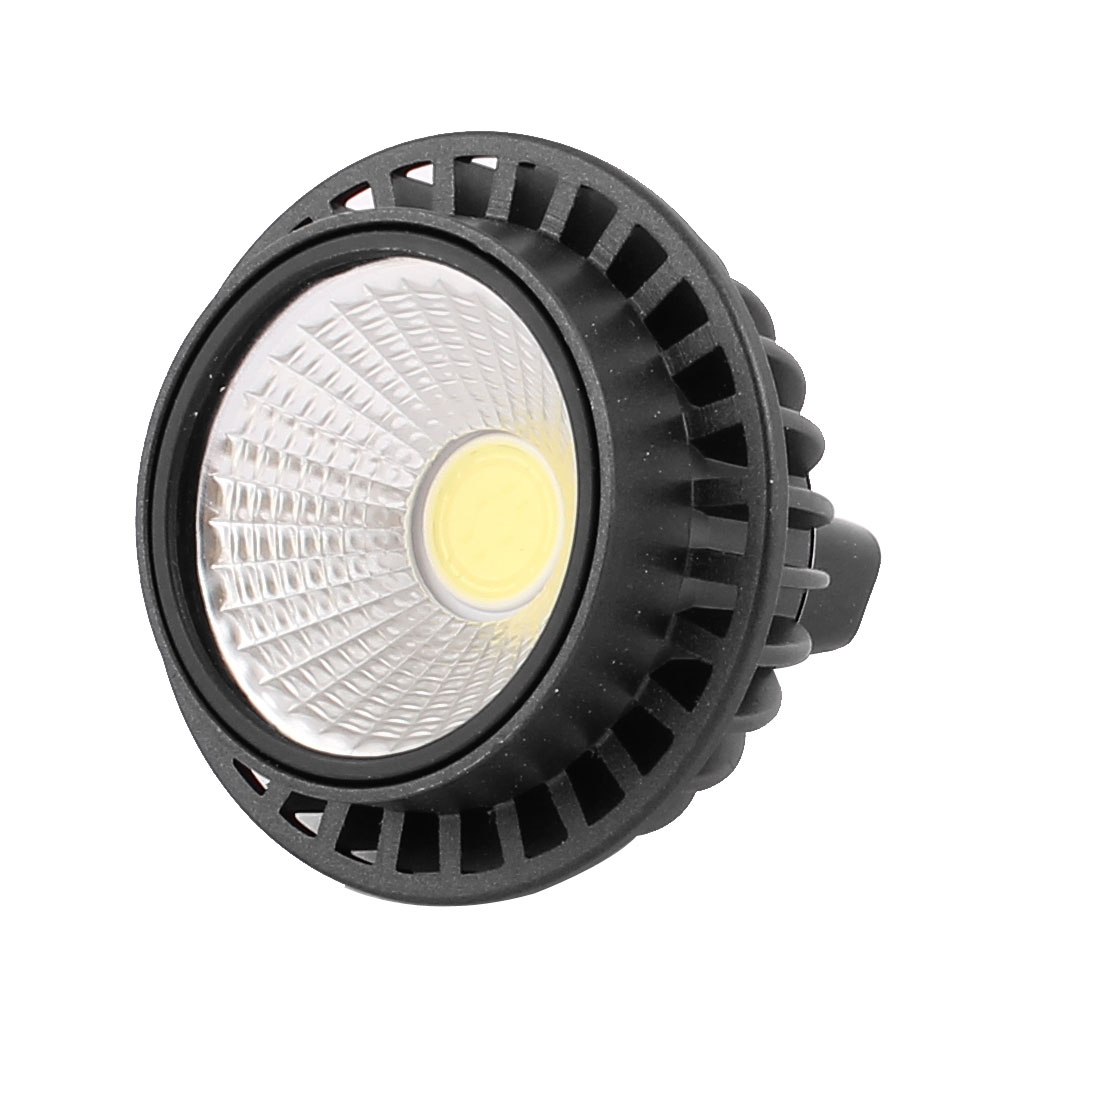 DC12V 3W MR16 COB LED Spotlight Lamp Bulb Round Downlight Pure White